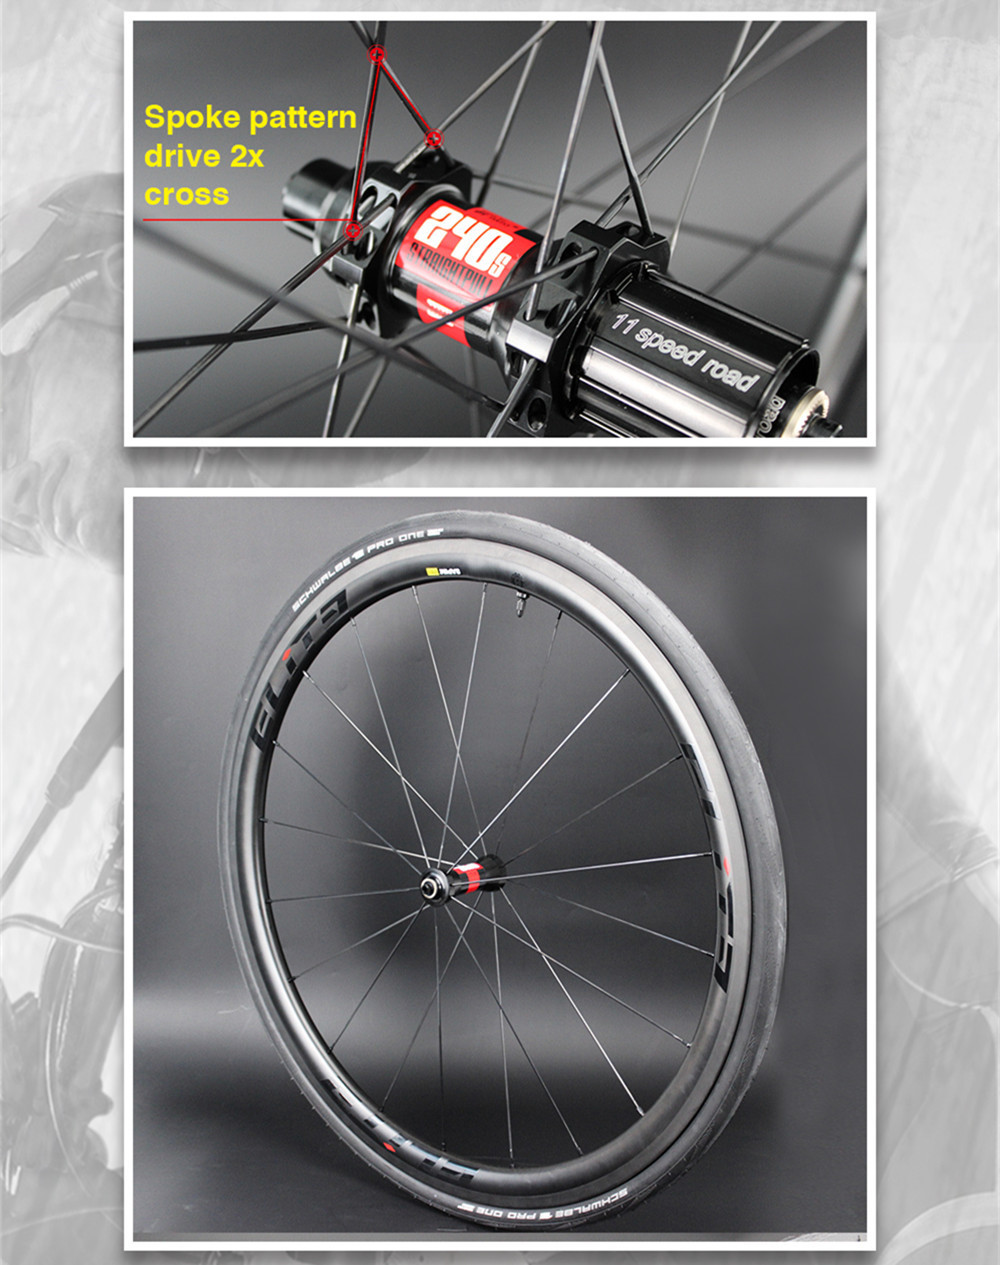 Elite KING DT 240S Carbon Bicycle Wheel 30 38 47 50 60 88 Depth Tubular Clincher Tubeless 700c Carbon Fiber Road Bike Wheelset